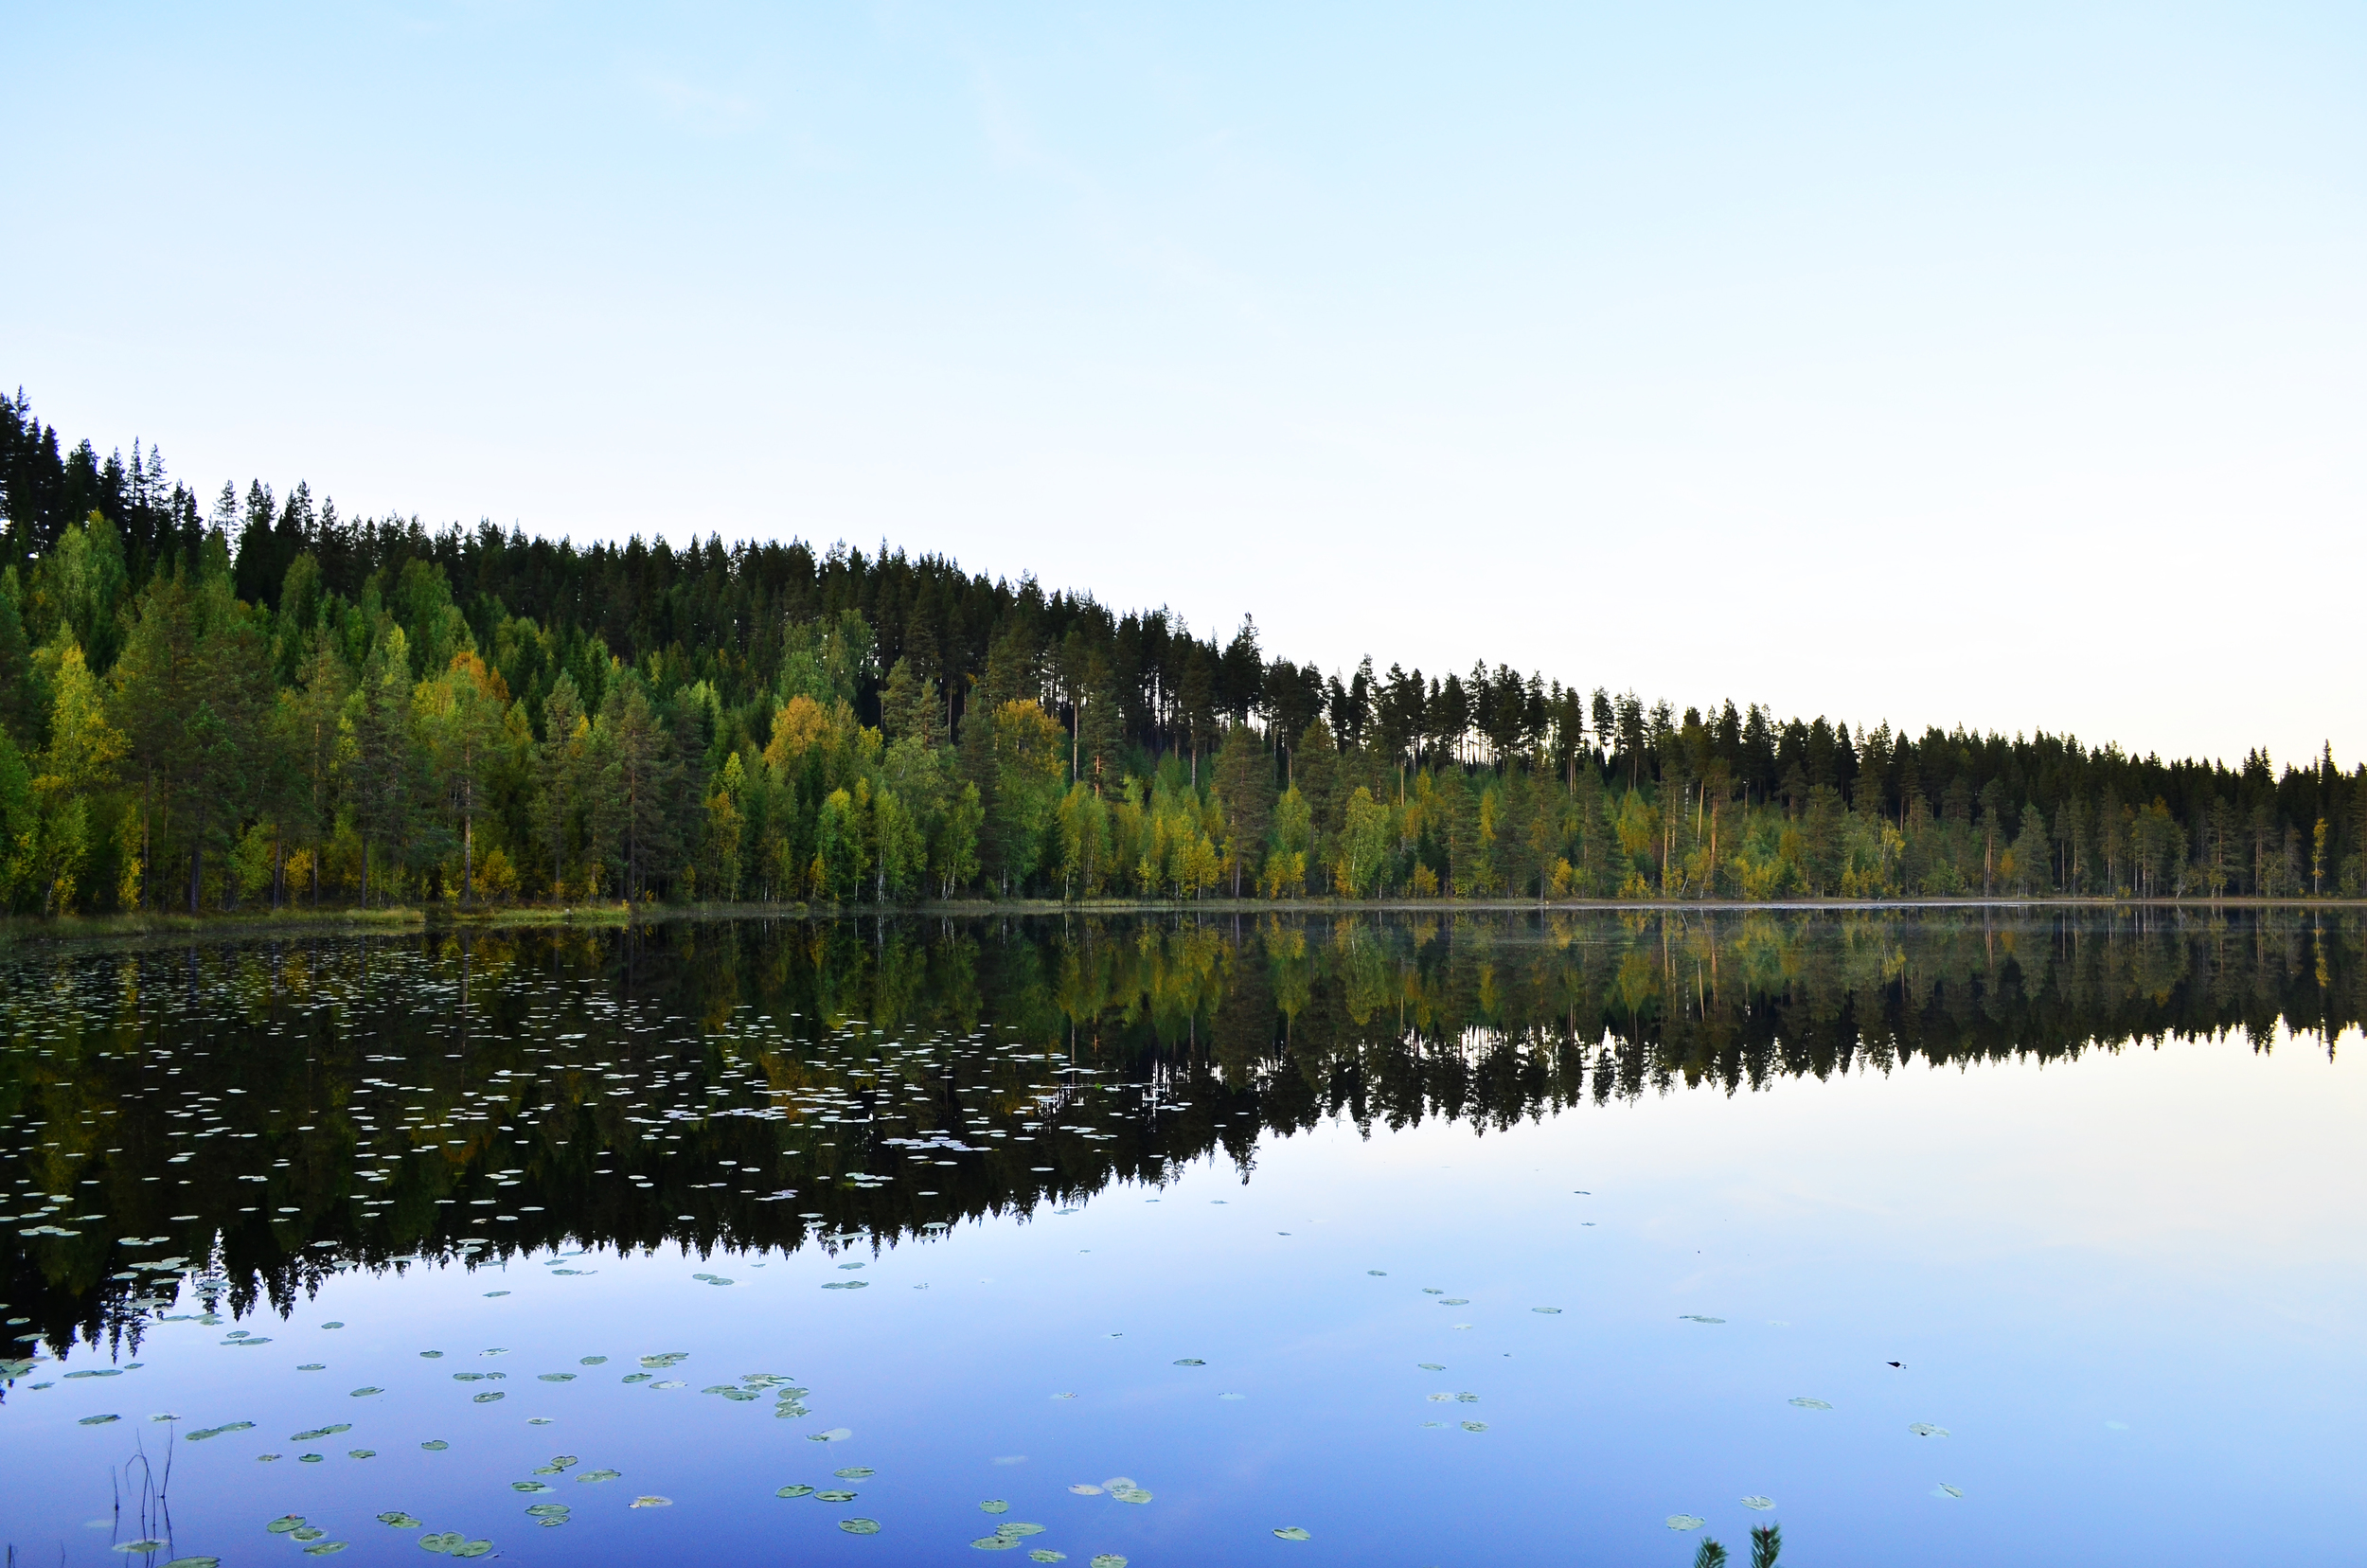 Lake Reflections, Jämtland, Sweden.